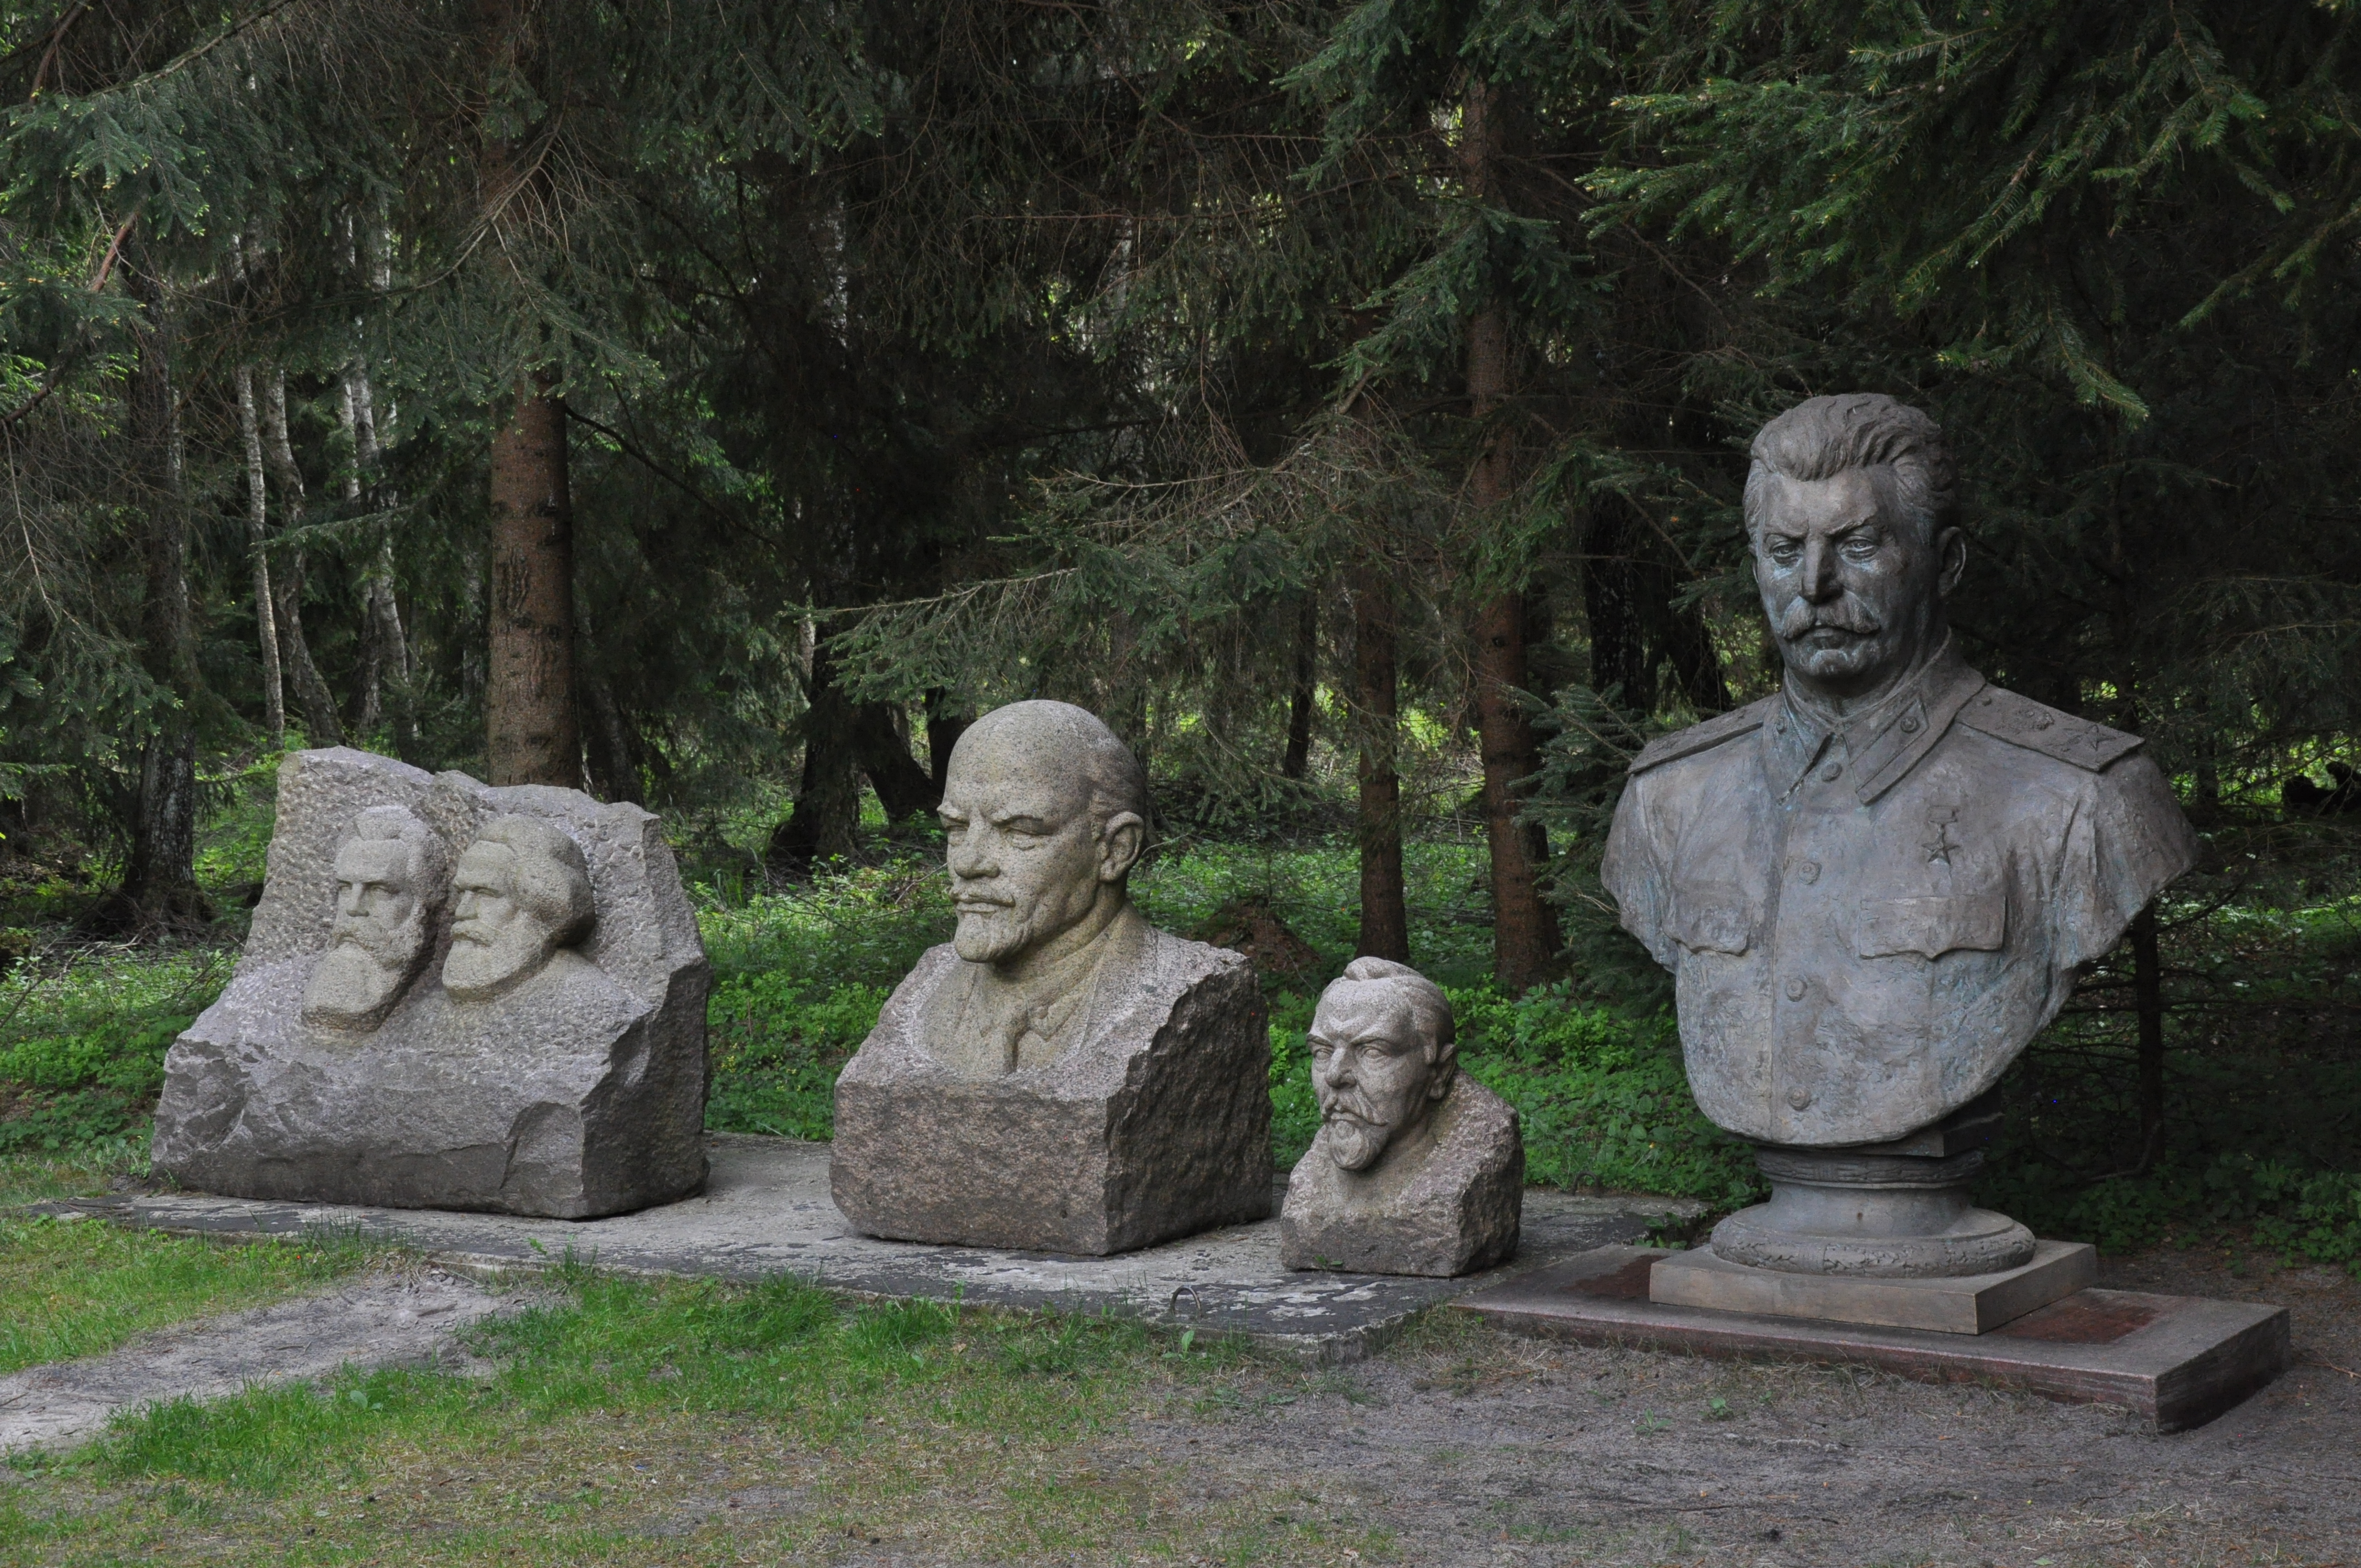 Lietuva 5: Cuckoos, past and present